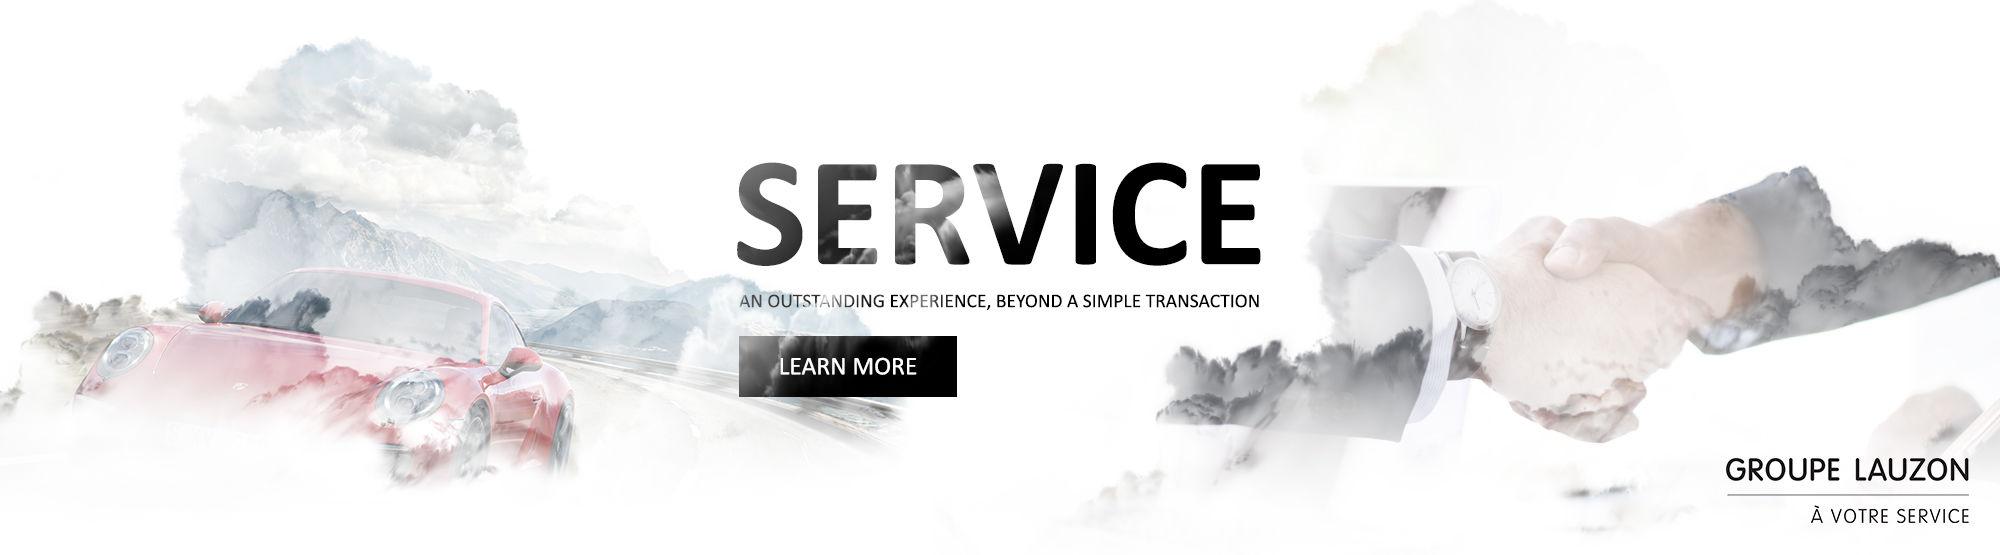 Service en